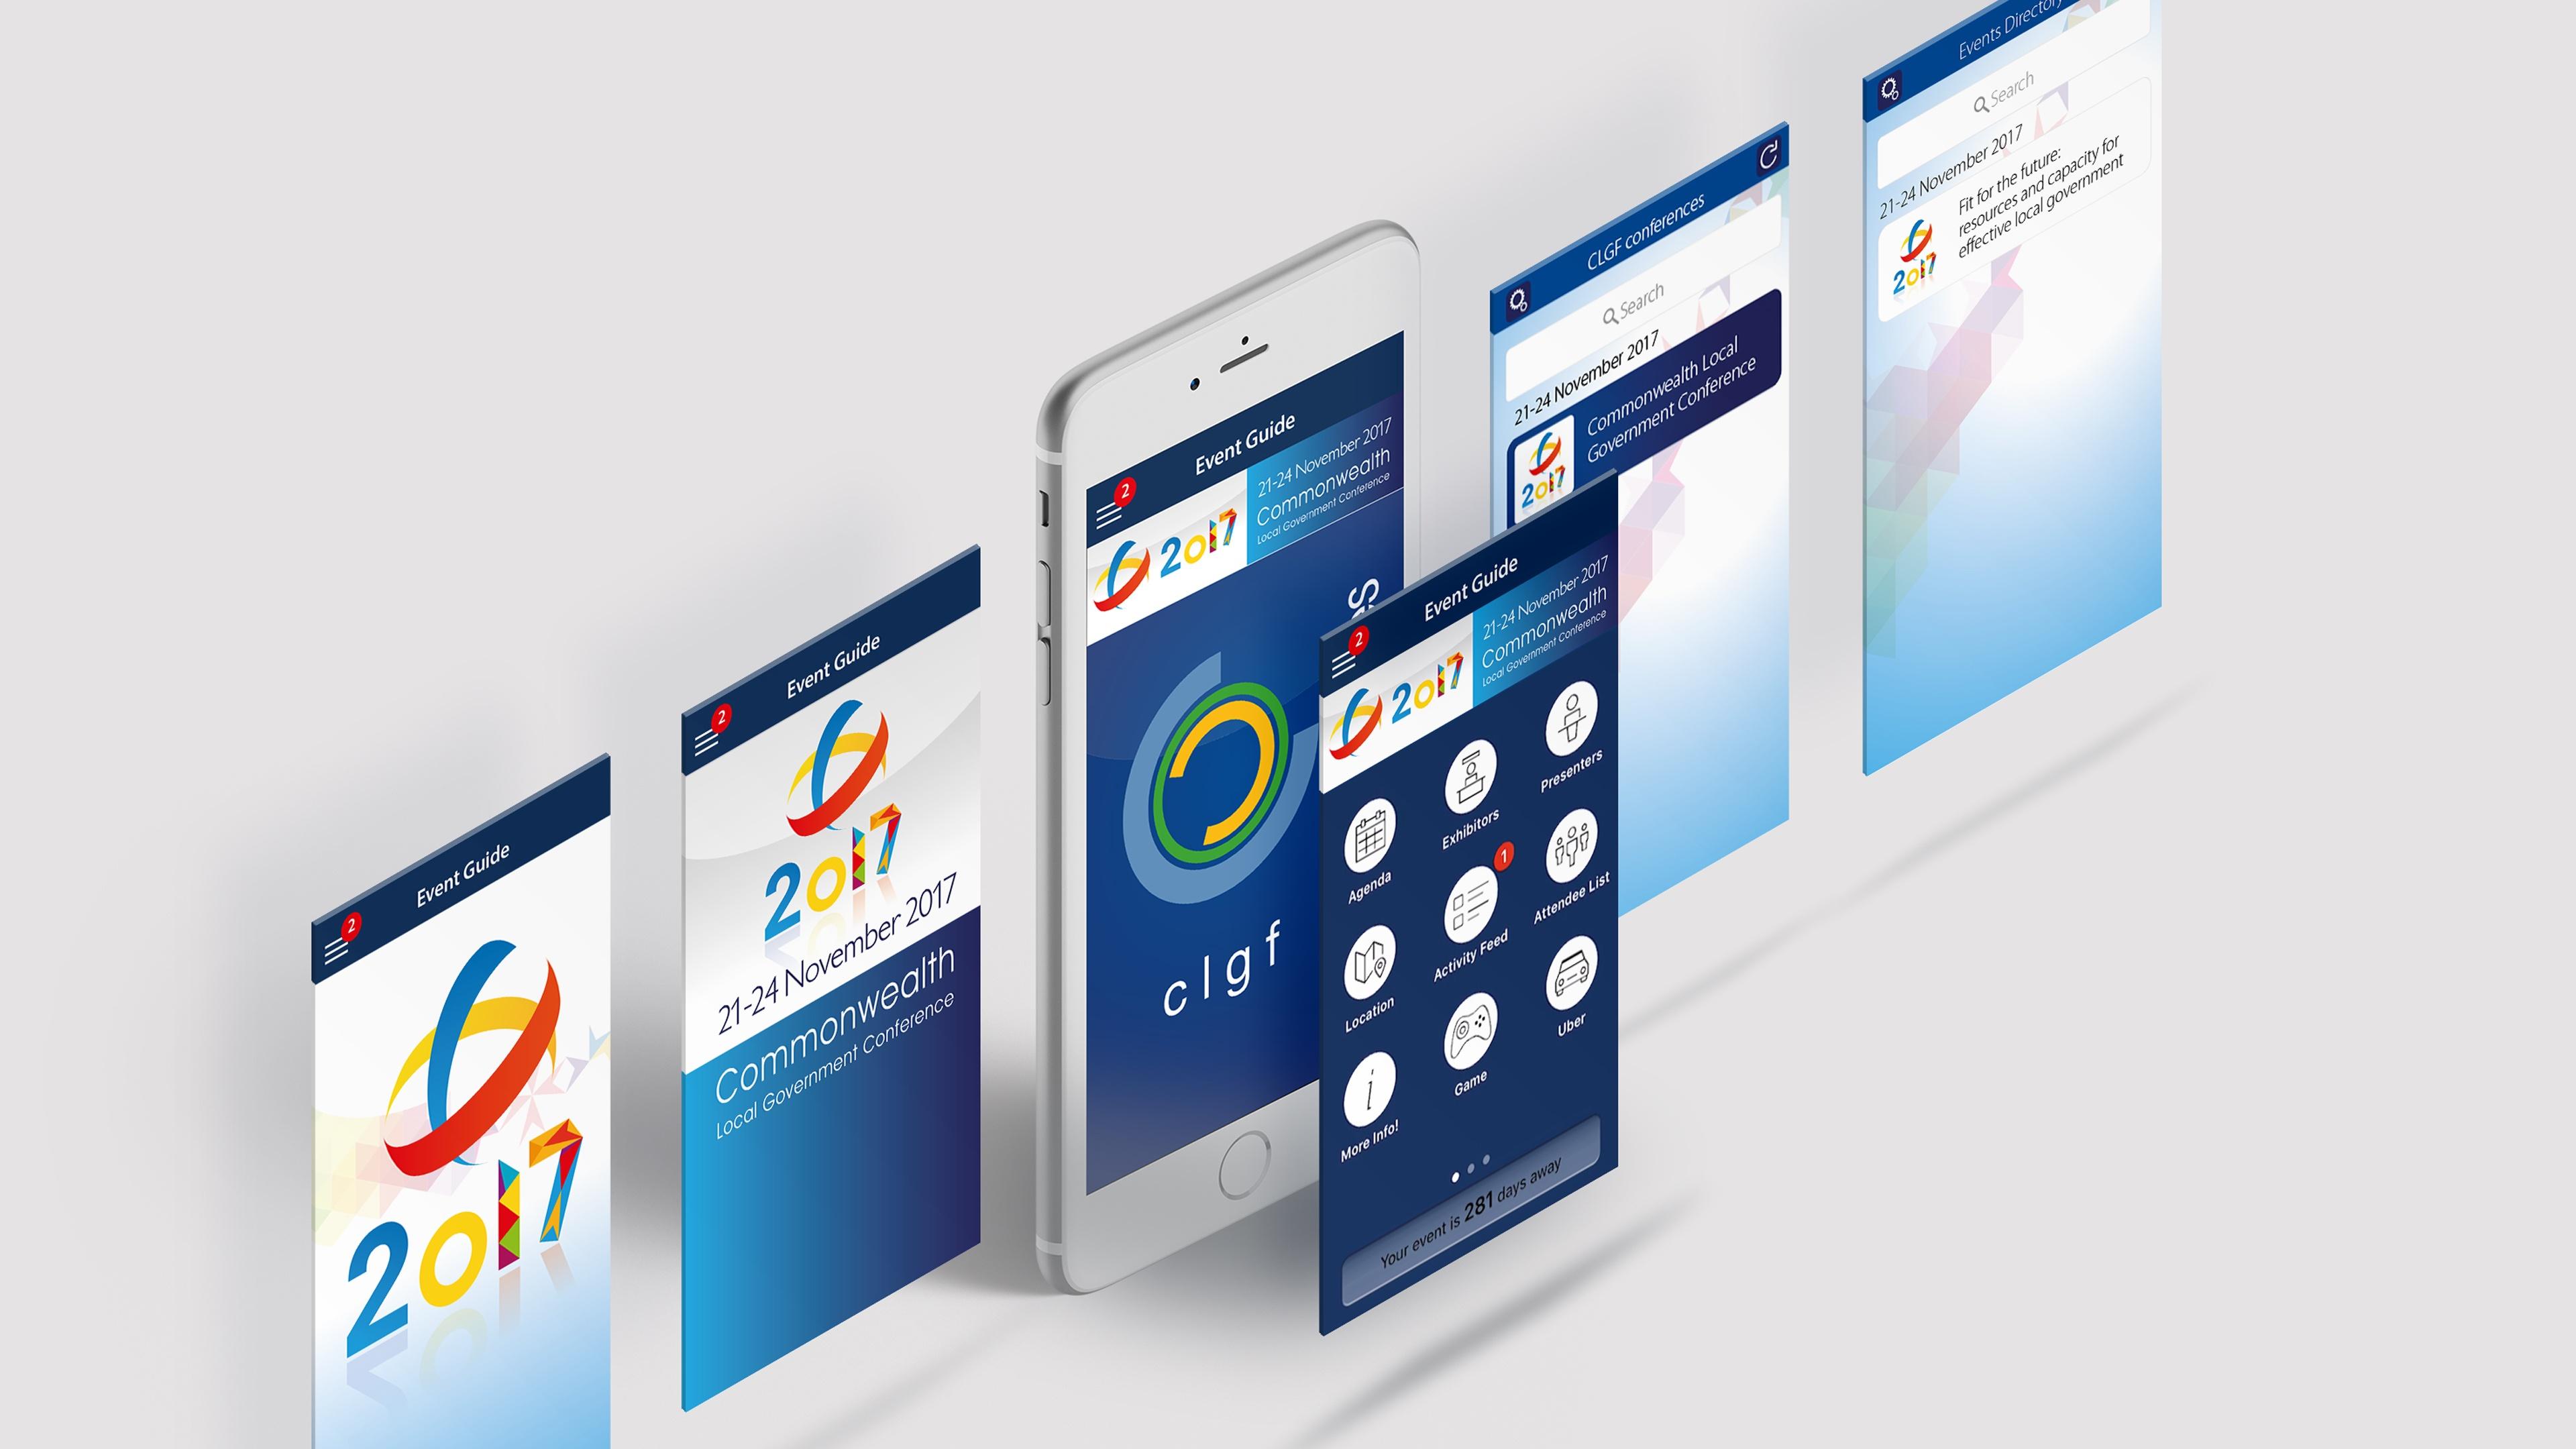 CLGF_mobile_app_graphics.jpg